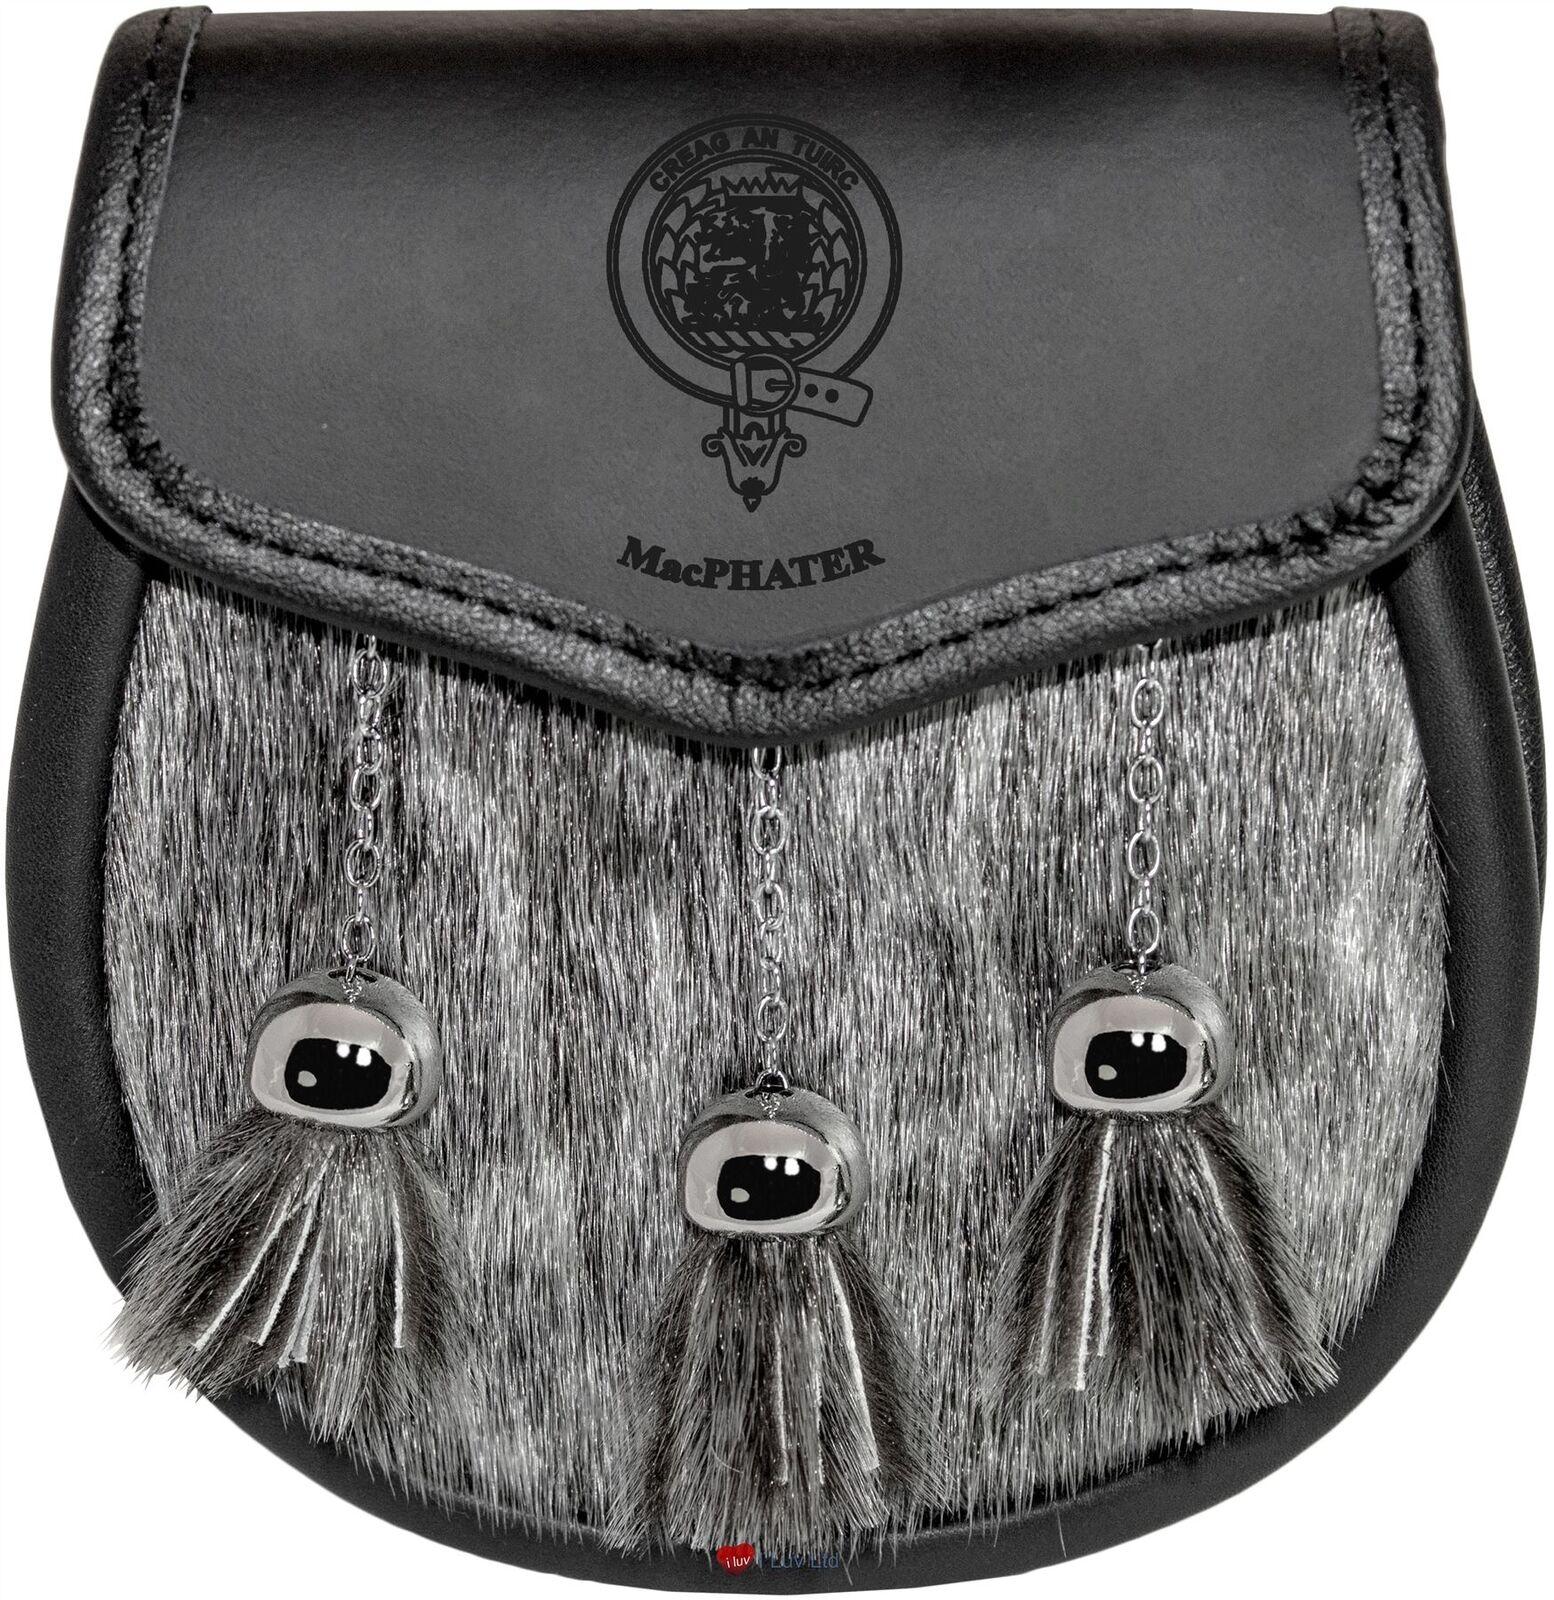 MacPhater Semi Sporran Fur Plain Leather Flap Scottish Clan Crest